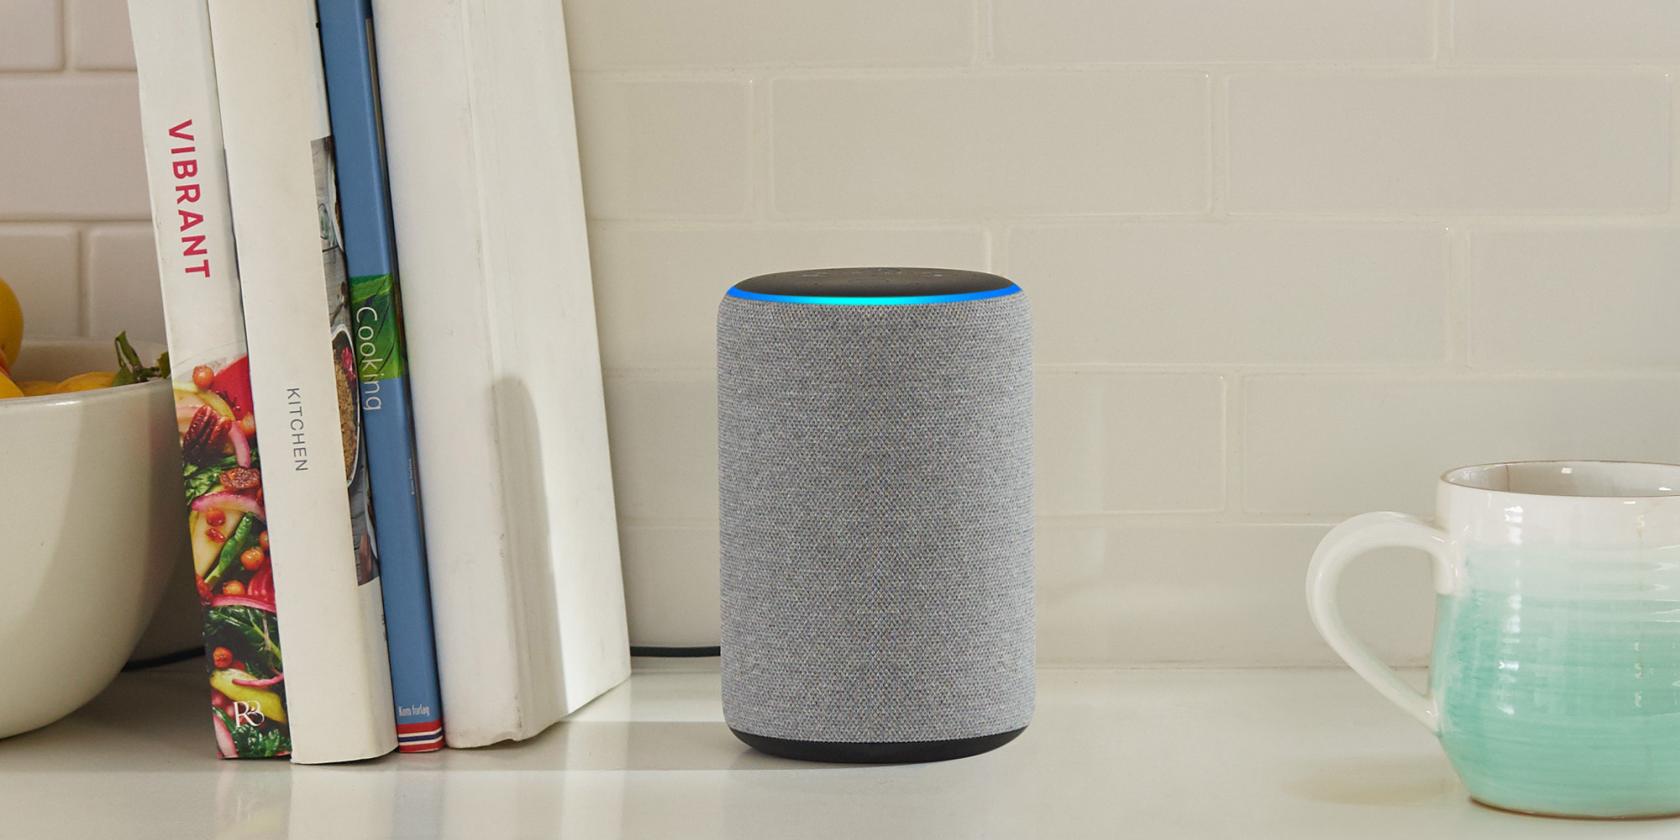 Amazon Alexa second generation smart speaker.